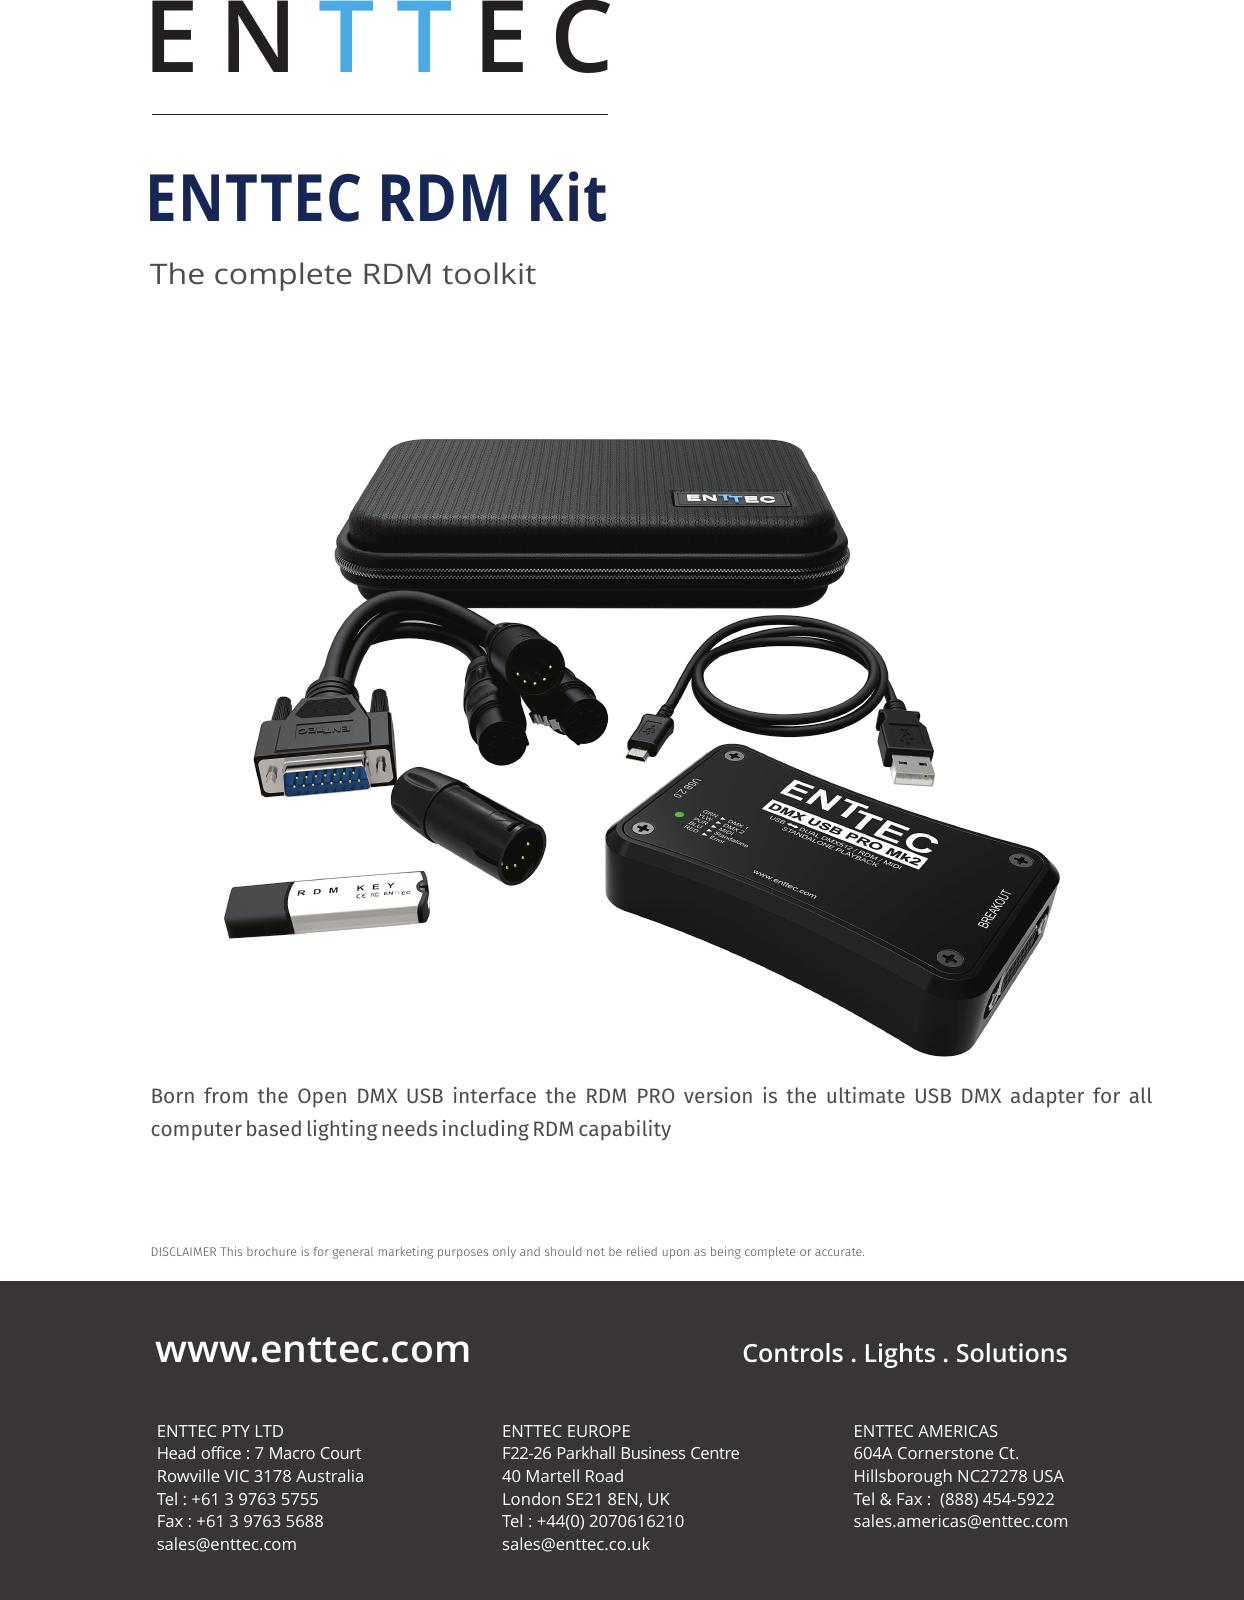 Enttec Rdm Kit Brochure User Manual